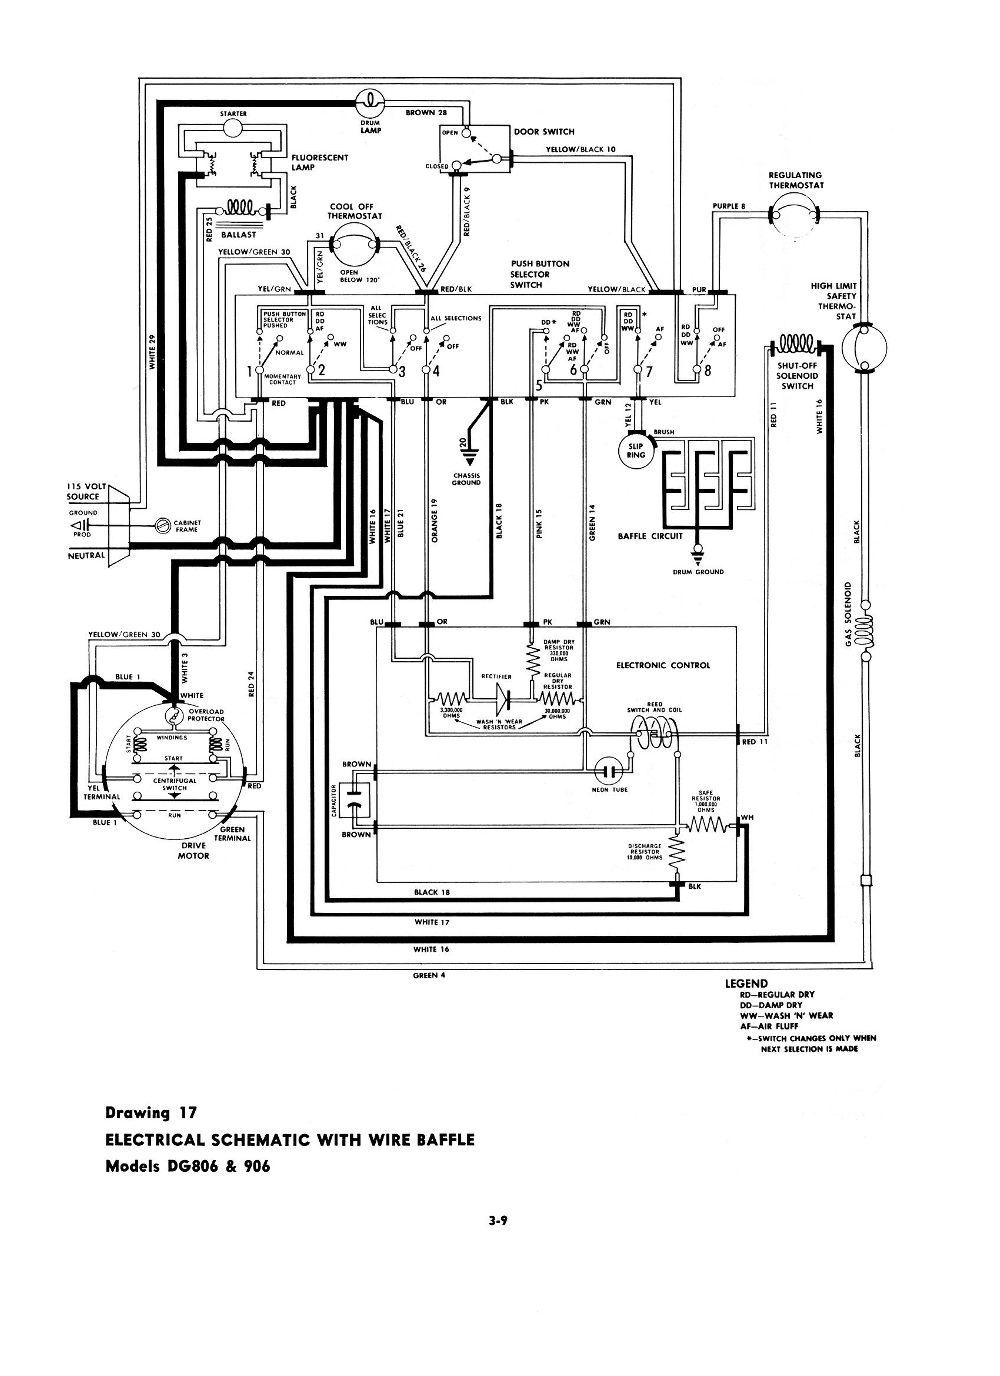 maytag dg606 capacitor